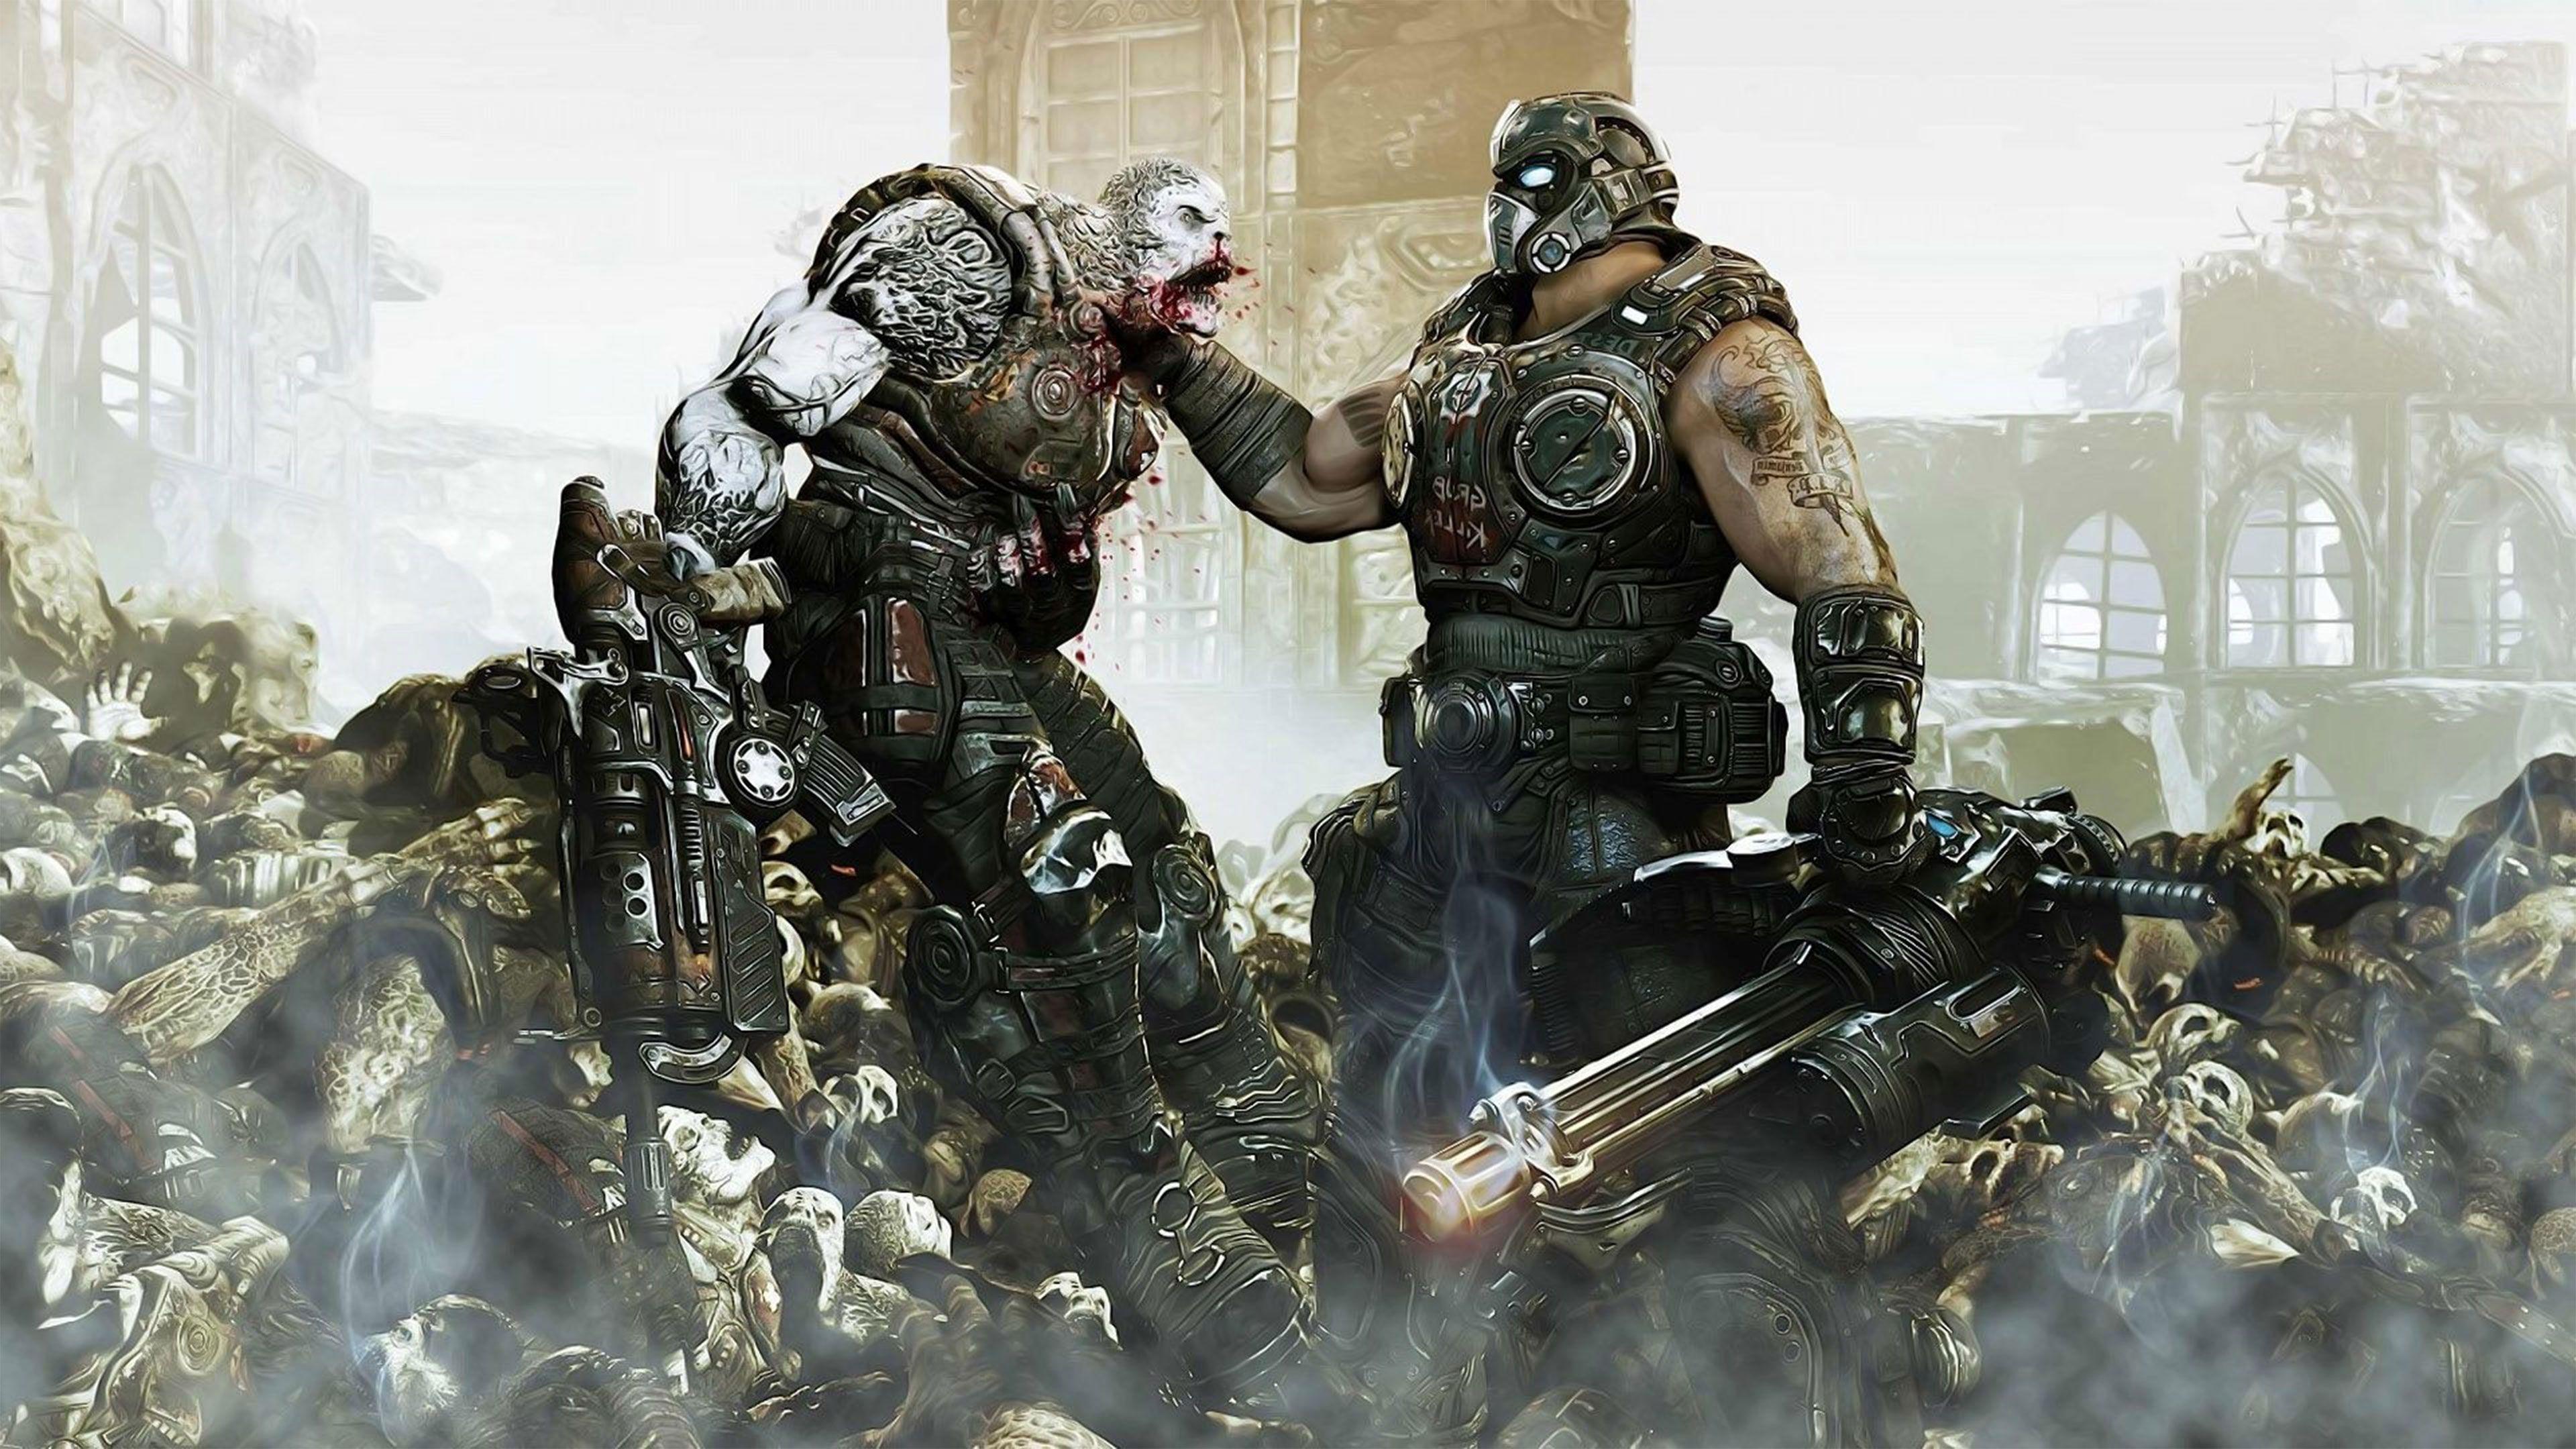 Gears Of War Wallpapers Top Free Gears Of War Backgrounds